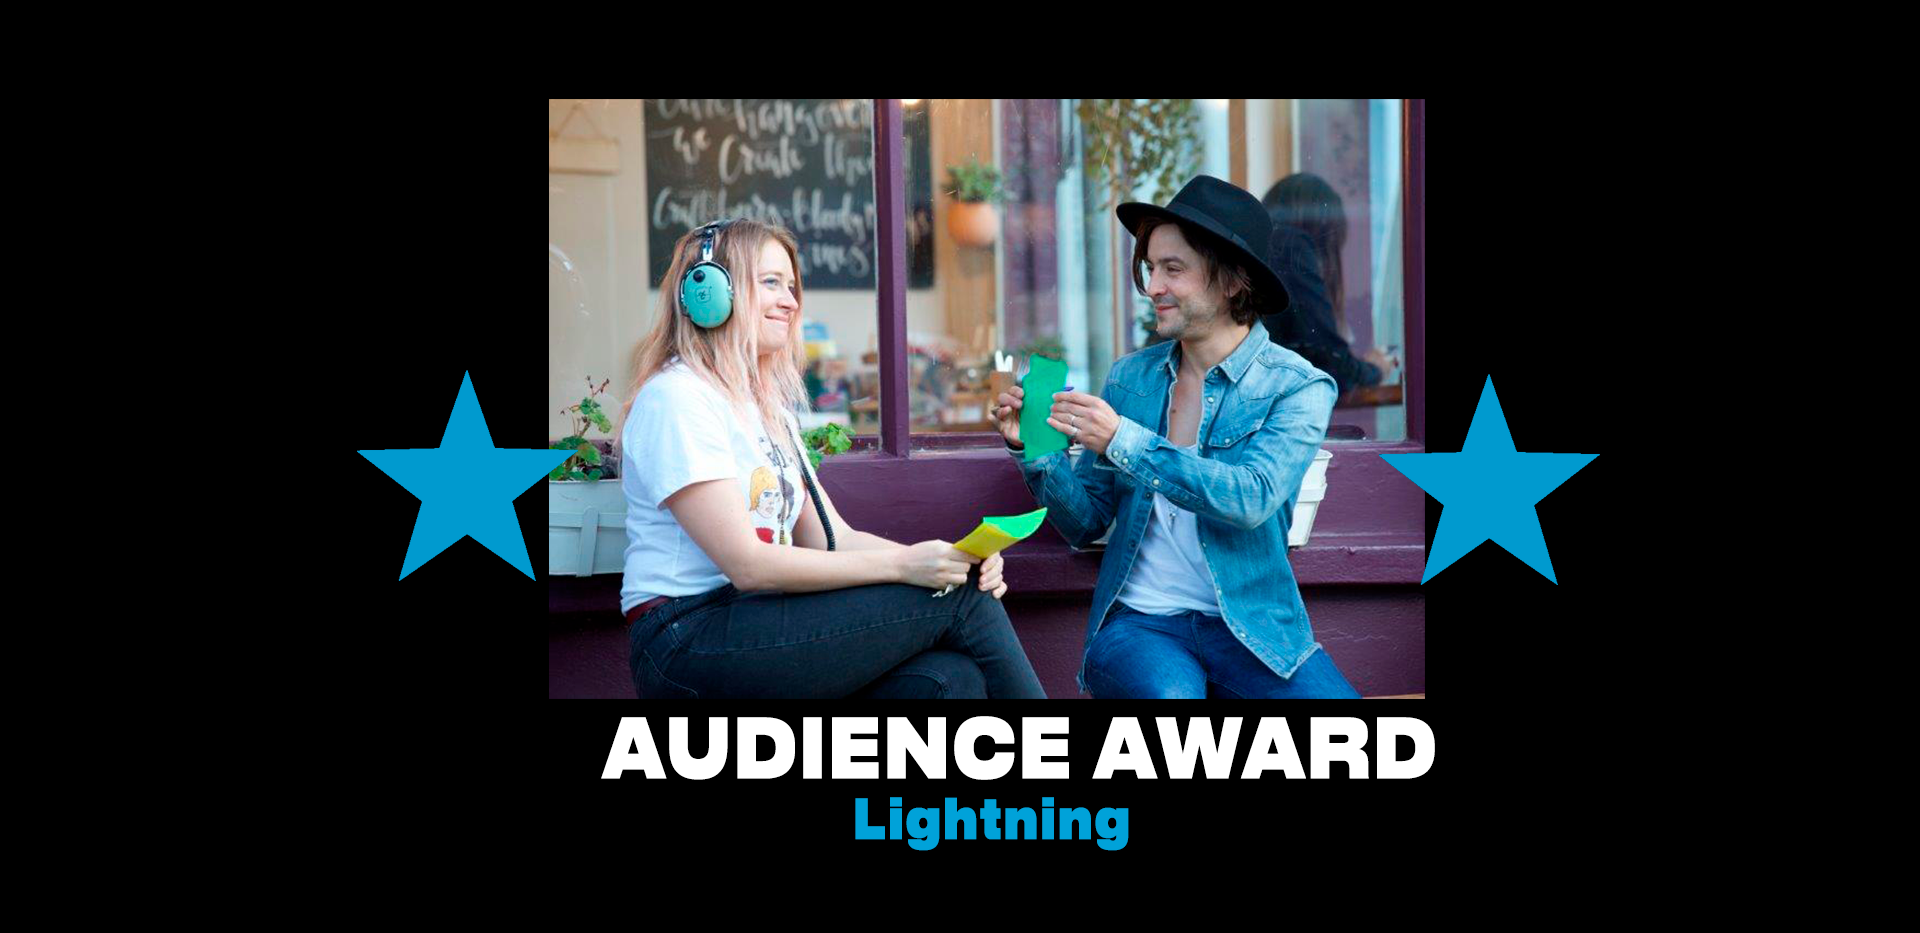 Audience Award Lightning.png